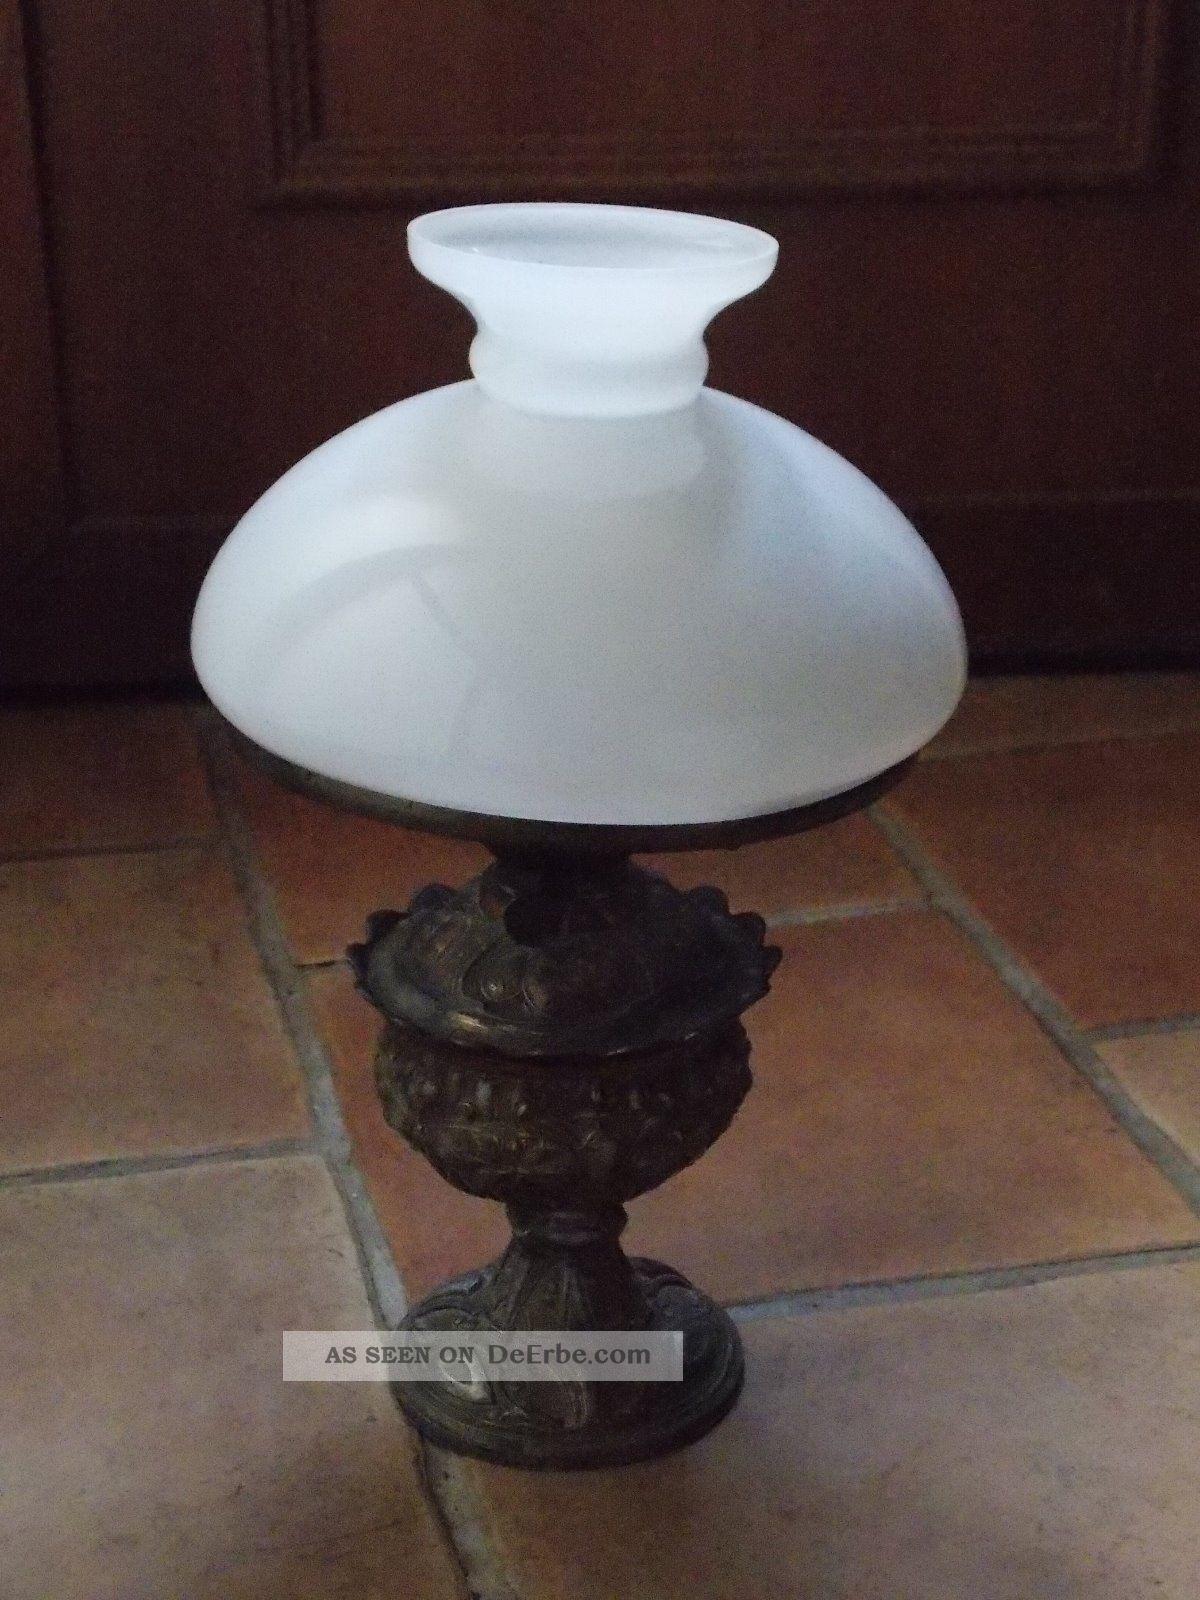 alte petroleum lampe mit wei en glasschirm. Black Bedroom Furniture Sets. Home Design Ideas